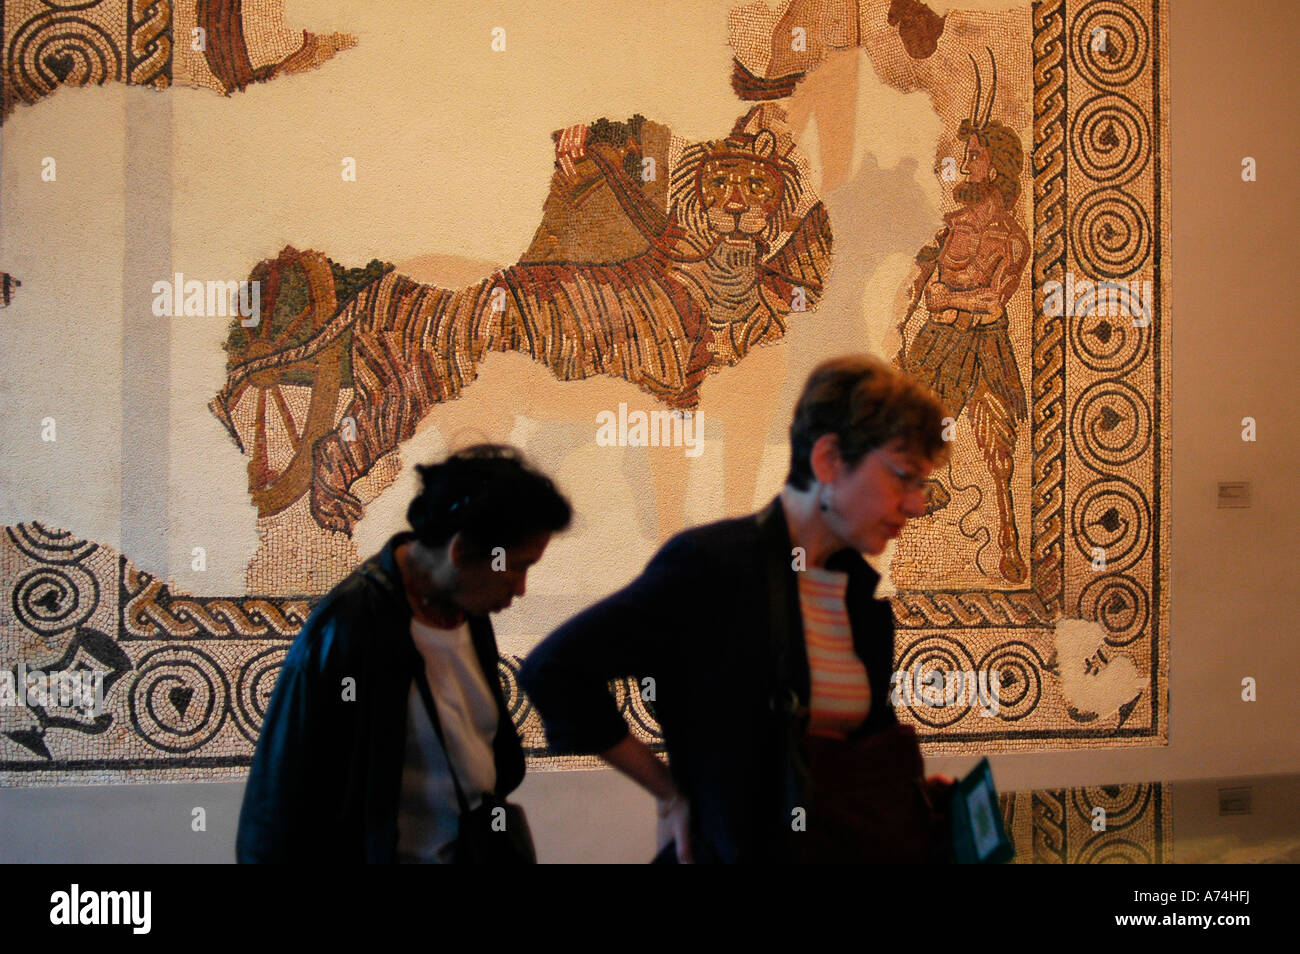 Roman mosaic of Baco victory Museum of Navarre PAMPLONA Navarre Spain Stock Photo